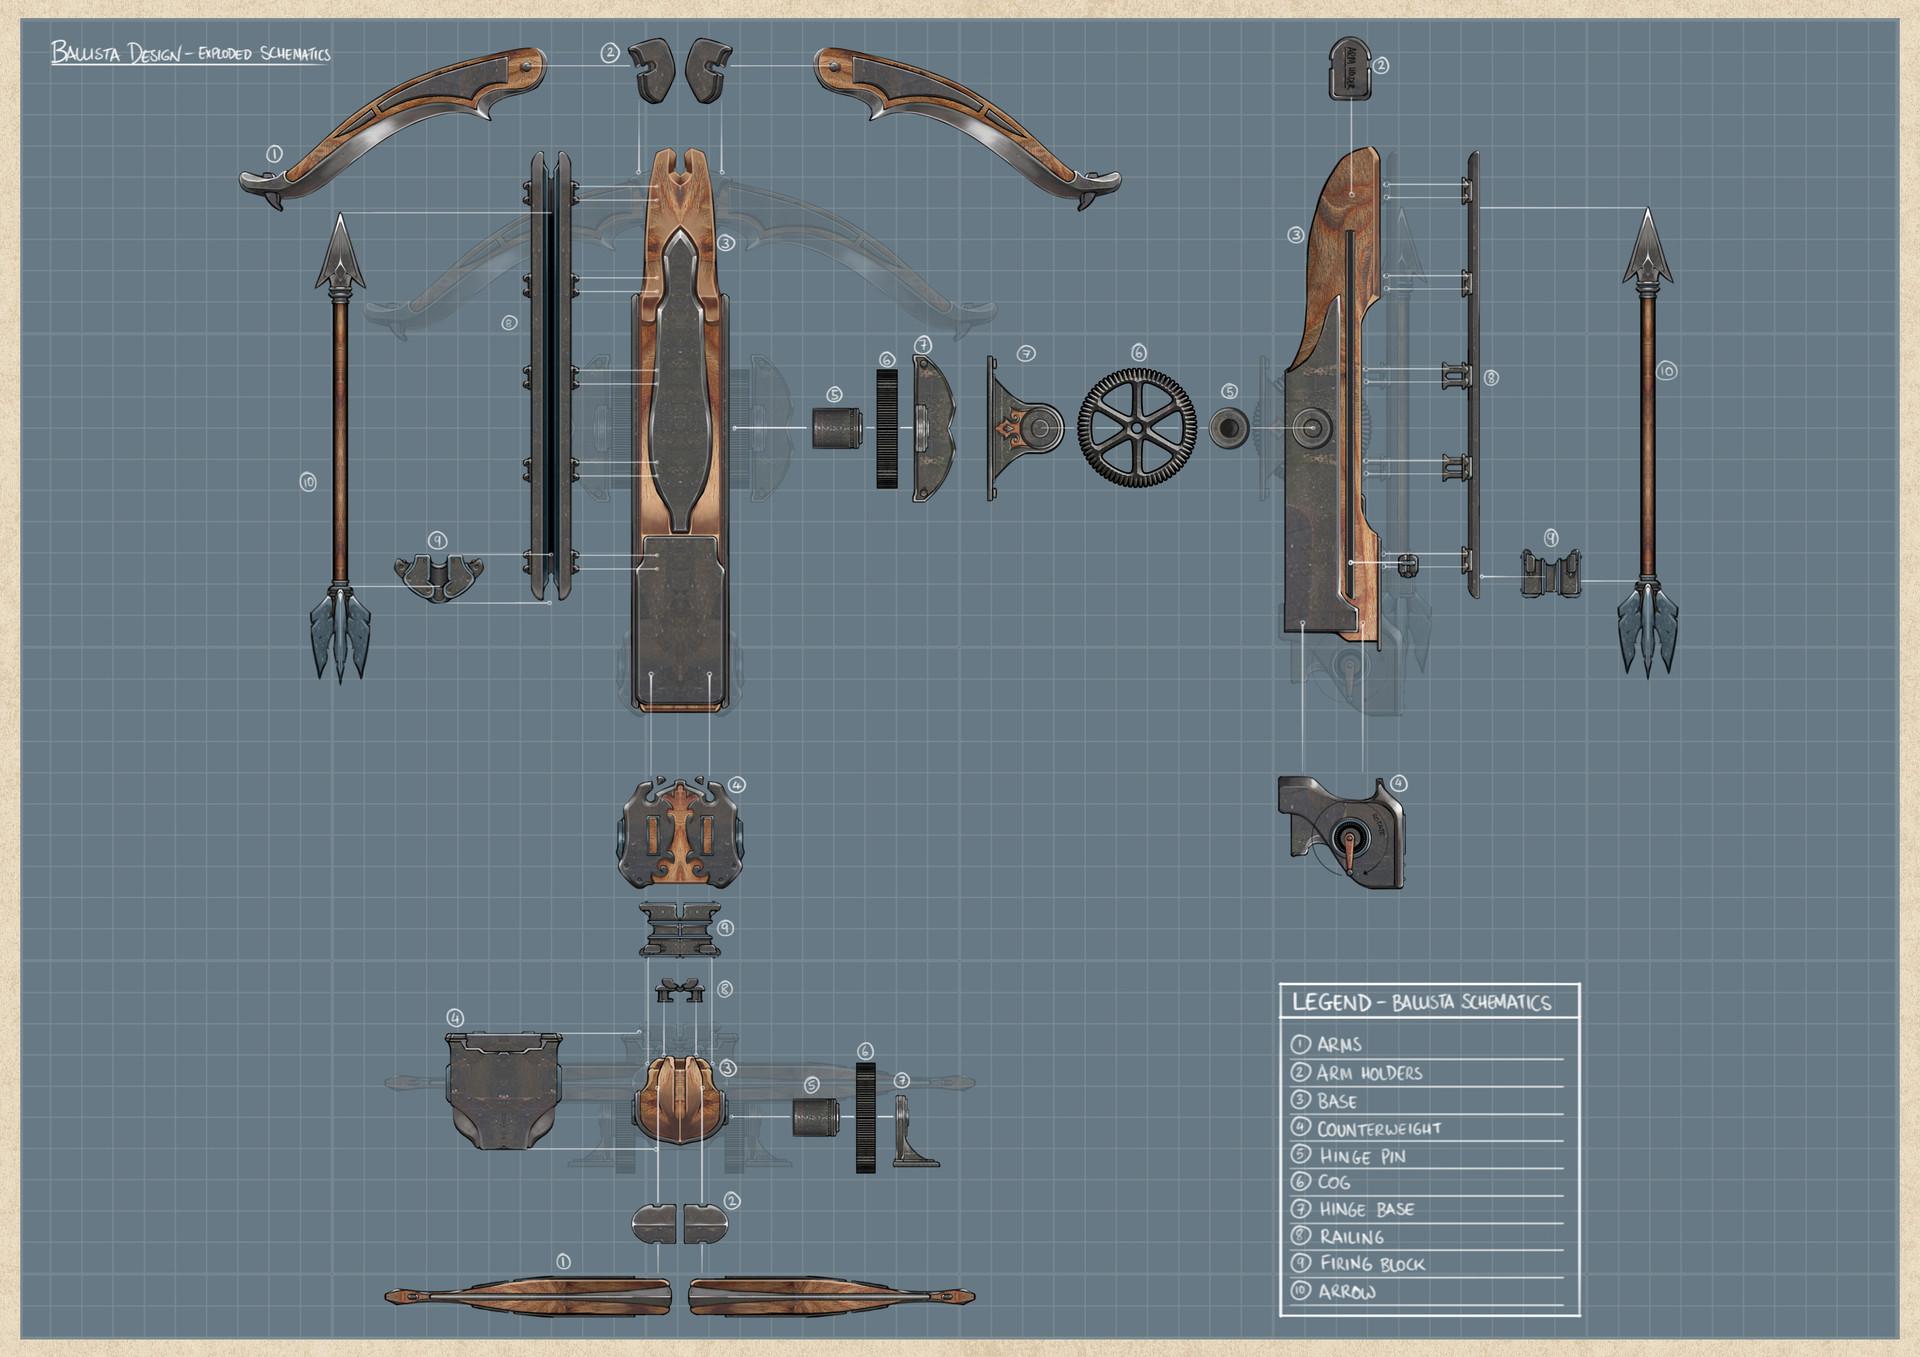 Tudor morris 04 ballista exploded schematics